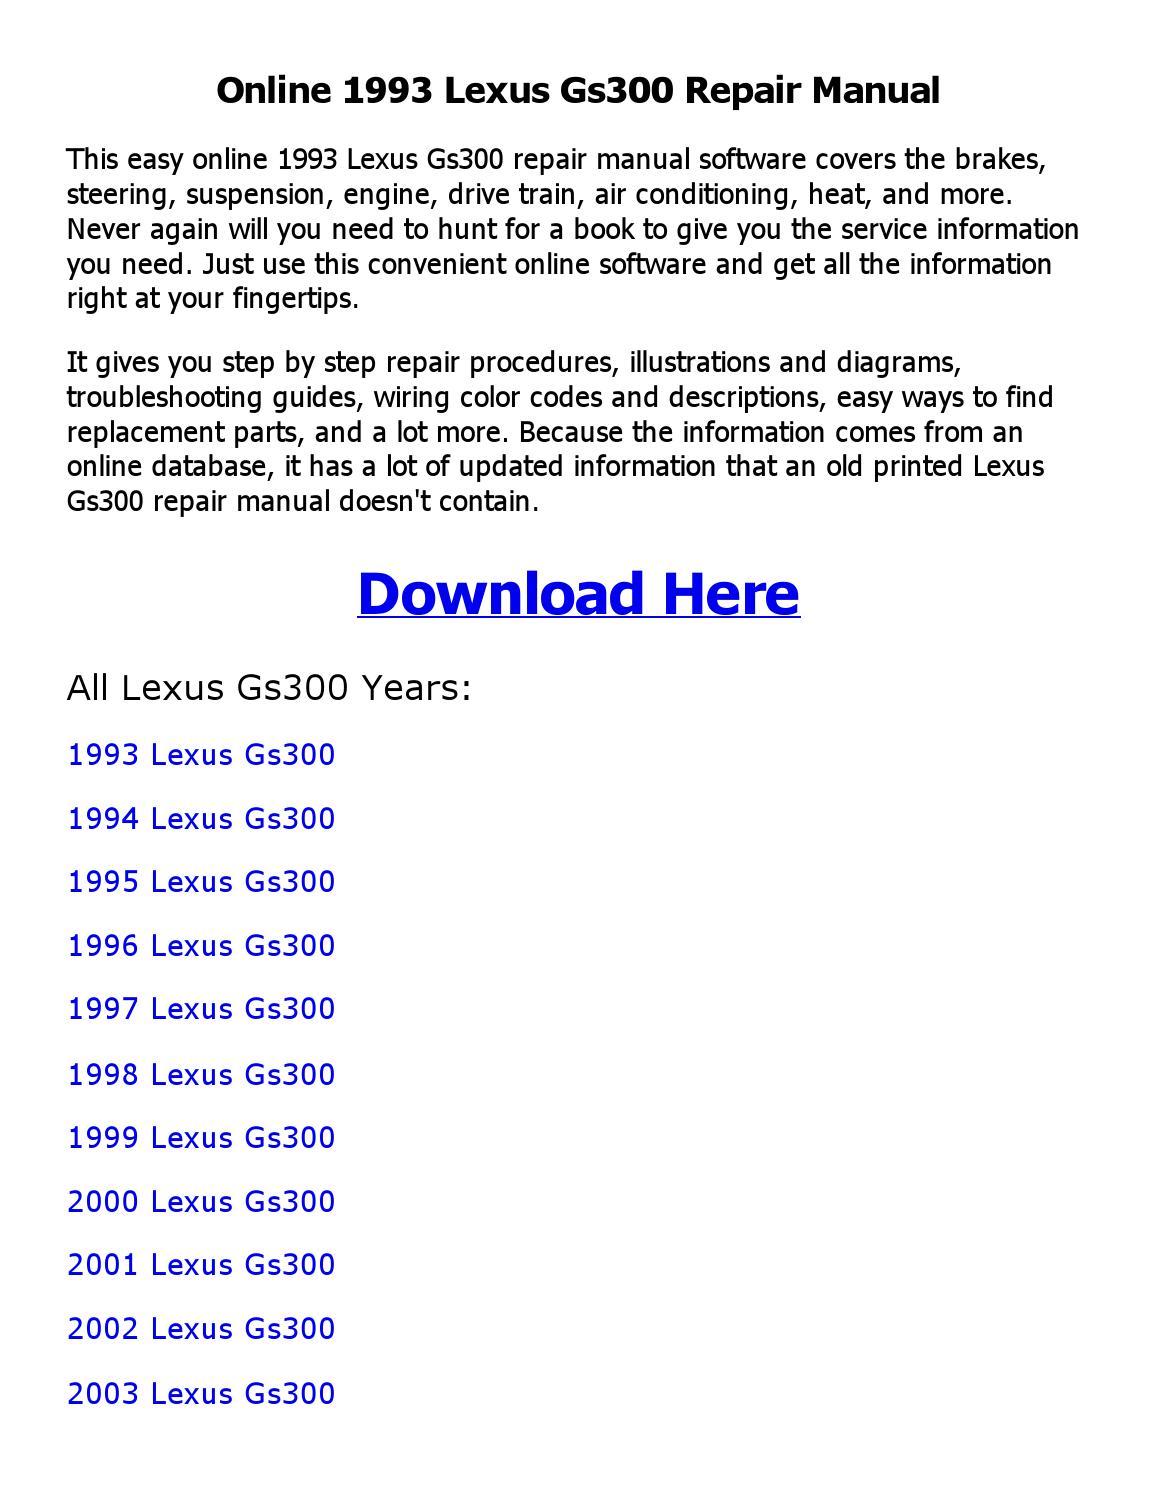 1993 Lexus Gs300 Repair Manual Online By Feri Dfebria Laksana Issuu 93 Wiring Diagram